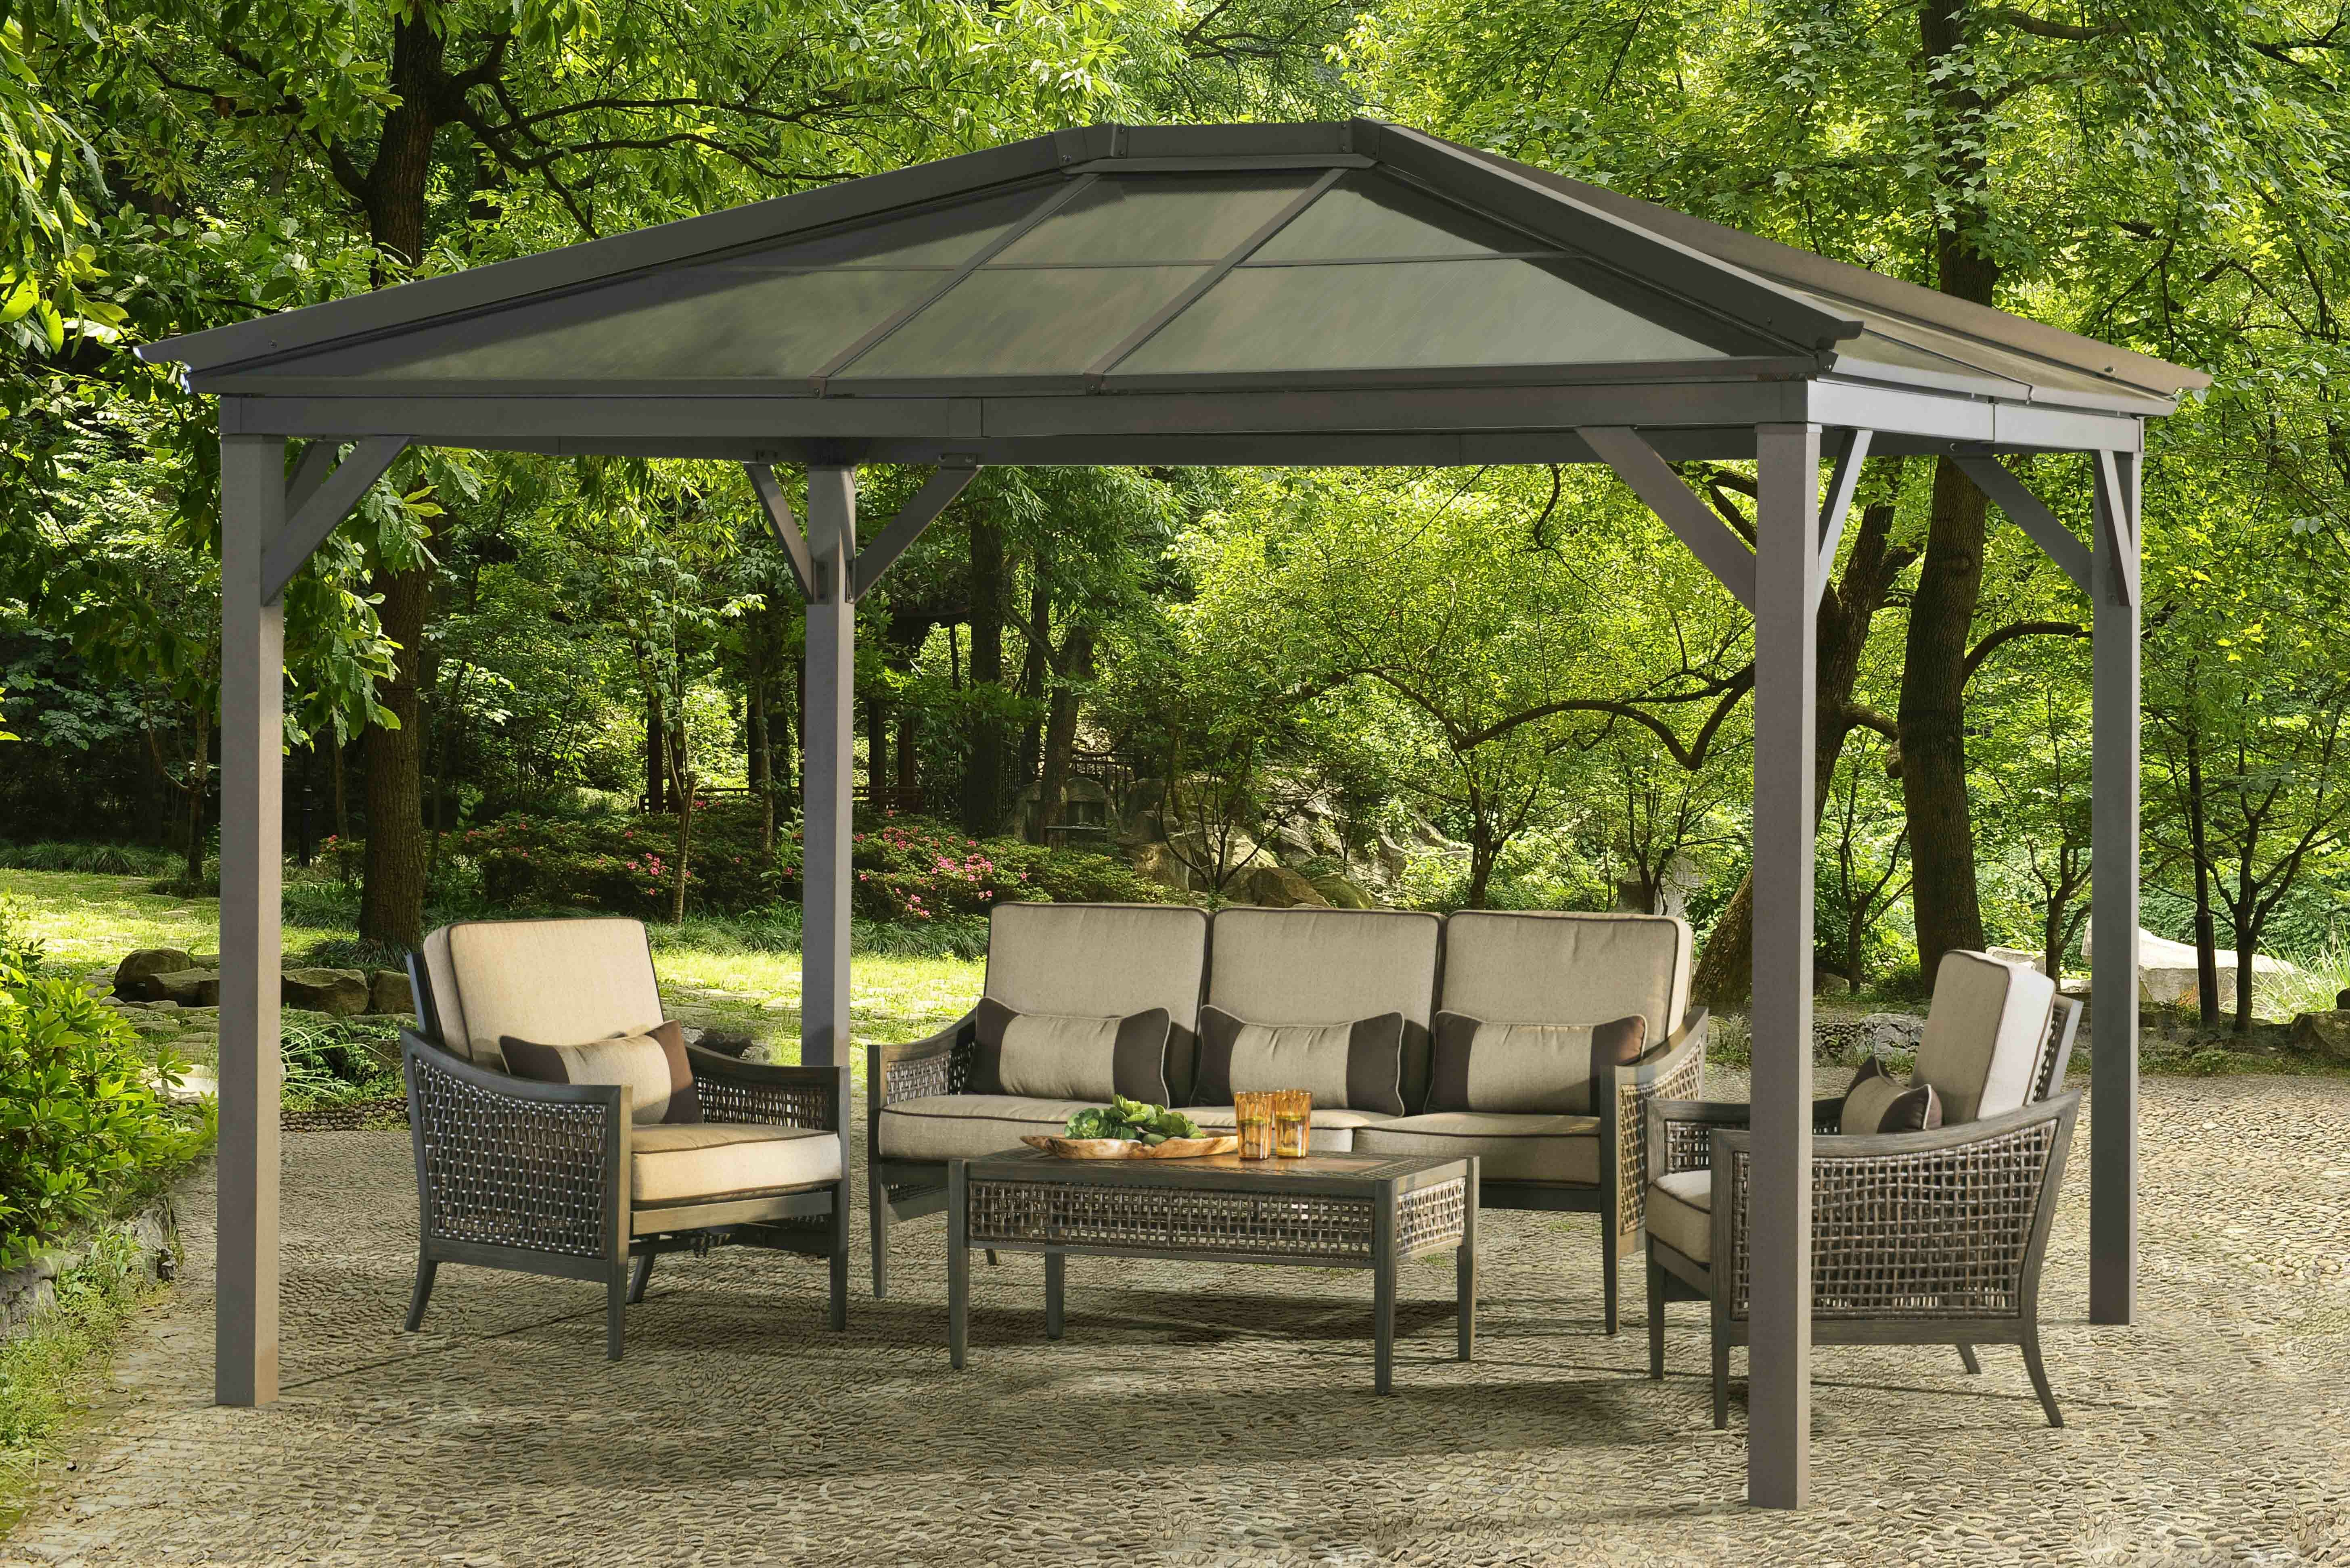 festival home ft backyard hayneedle decoration canopy patio x outdoor tent gazebo coral coast gallery